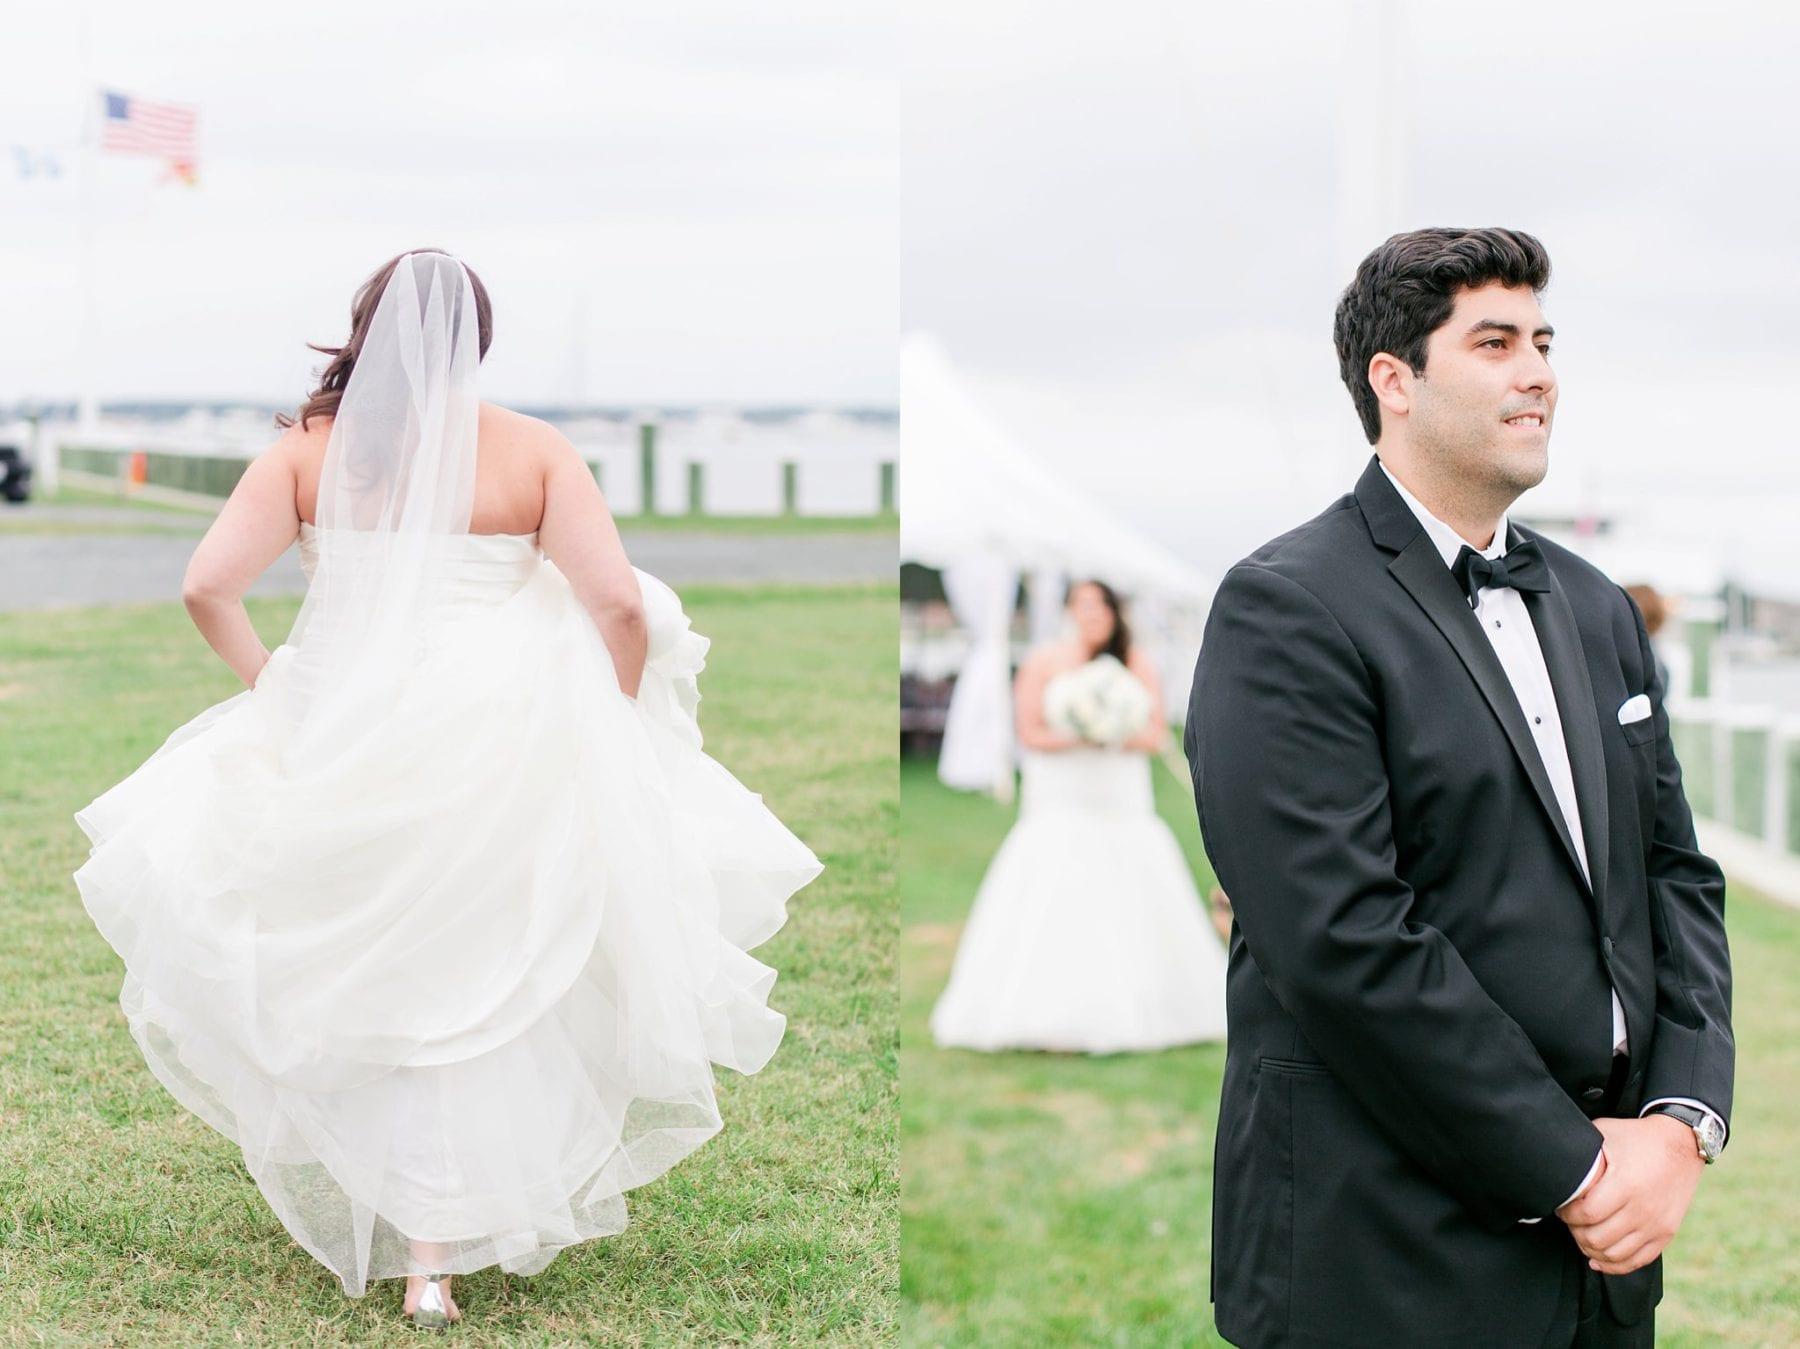 Chesapeake Bay Maritime Museum Wedding Photos Maryland Wedding Photographer Megan Kelsey Photography Halie & Mike-39.jpg